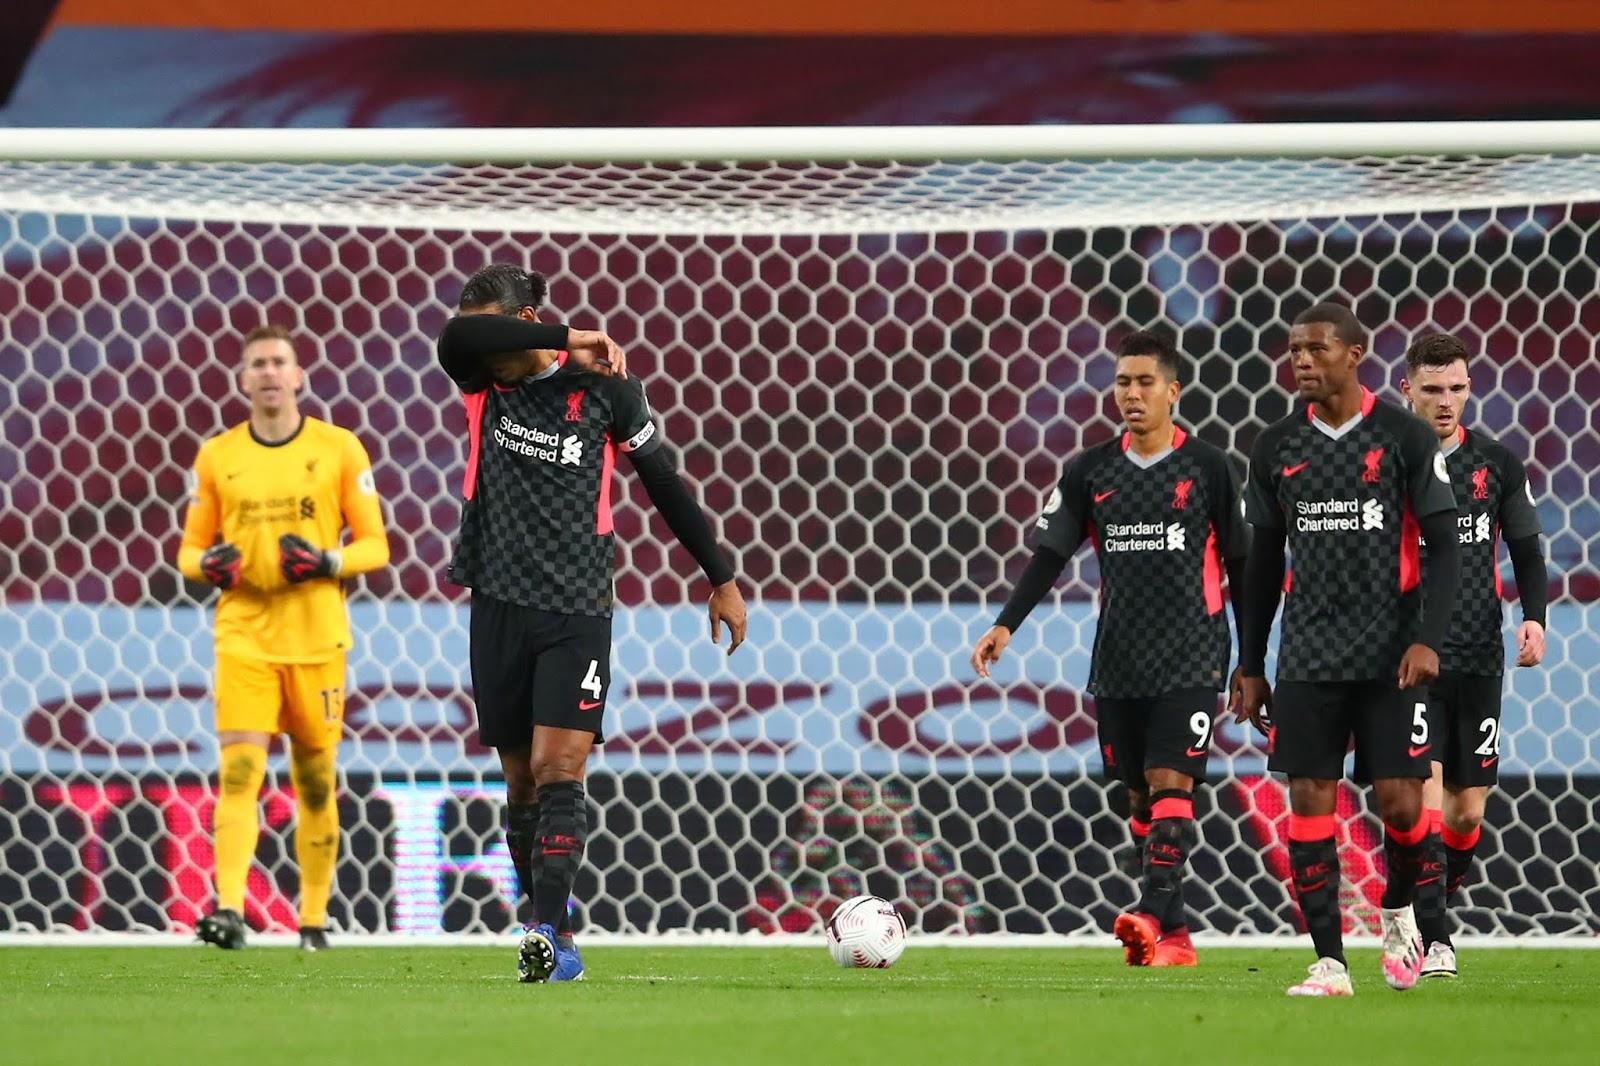 Aston Villa 7 Liverpool 2 Premier League